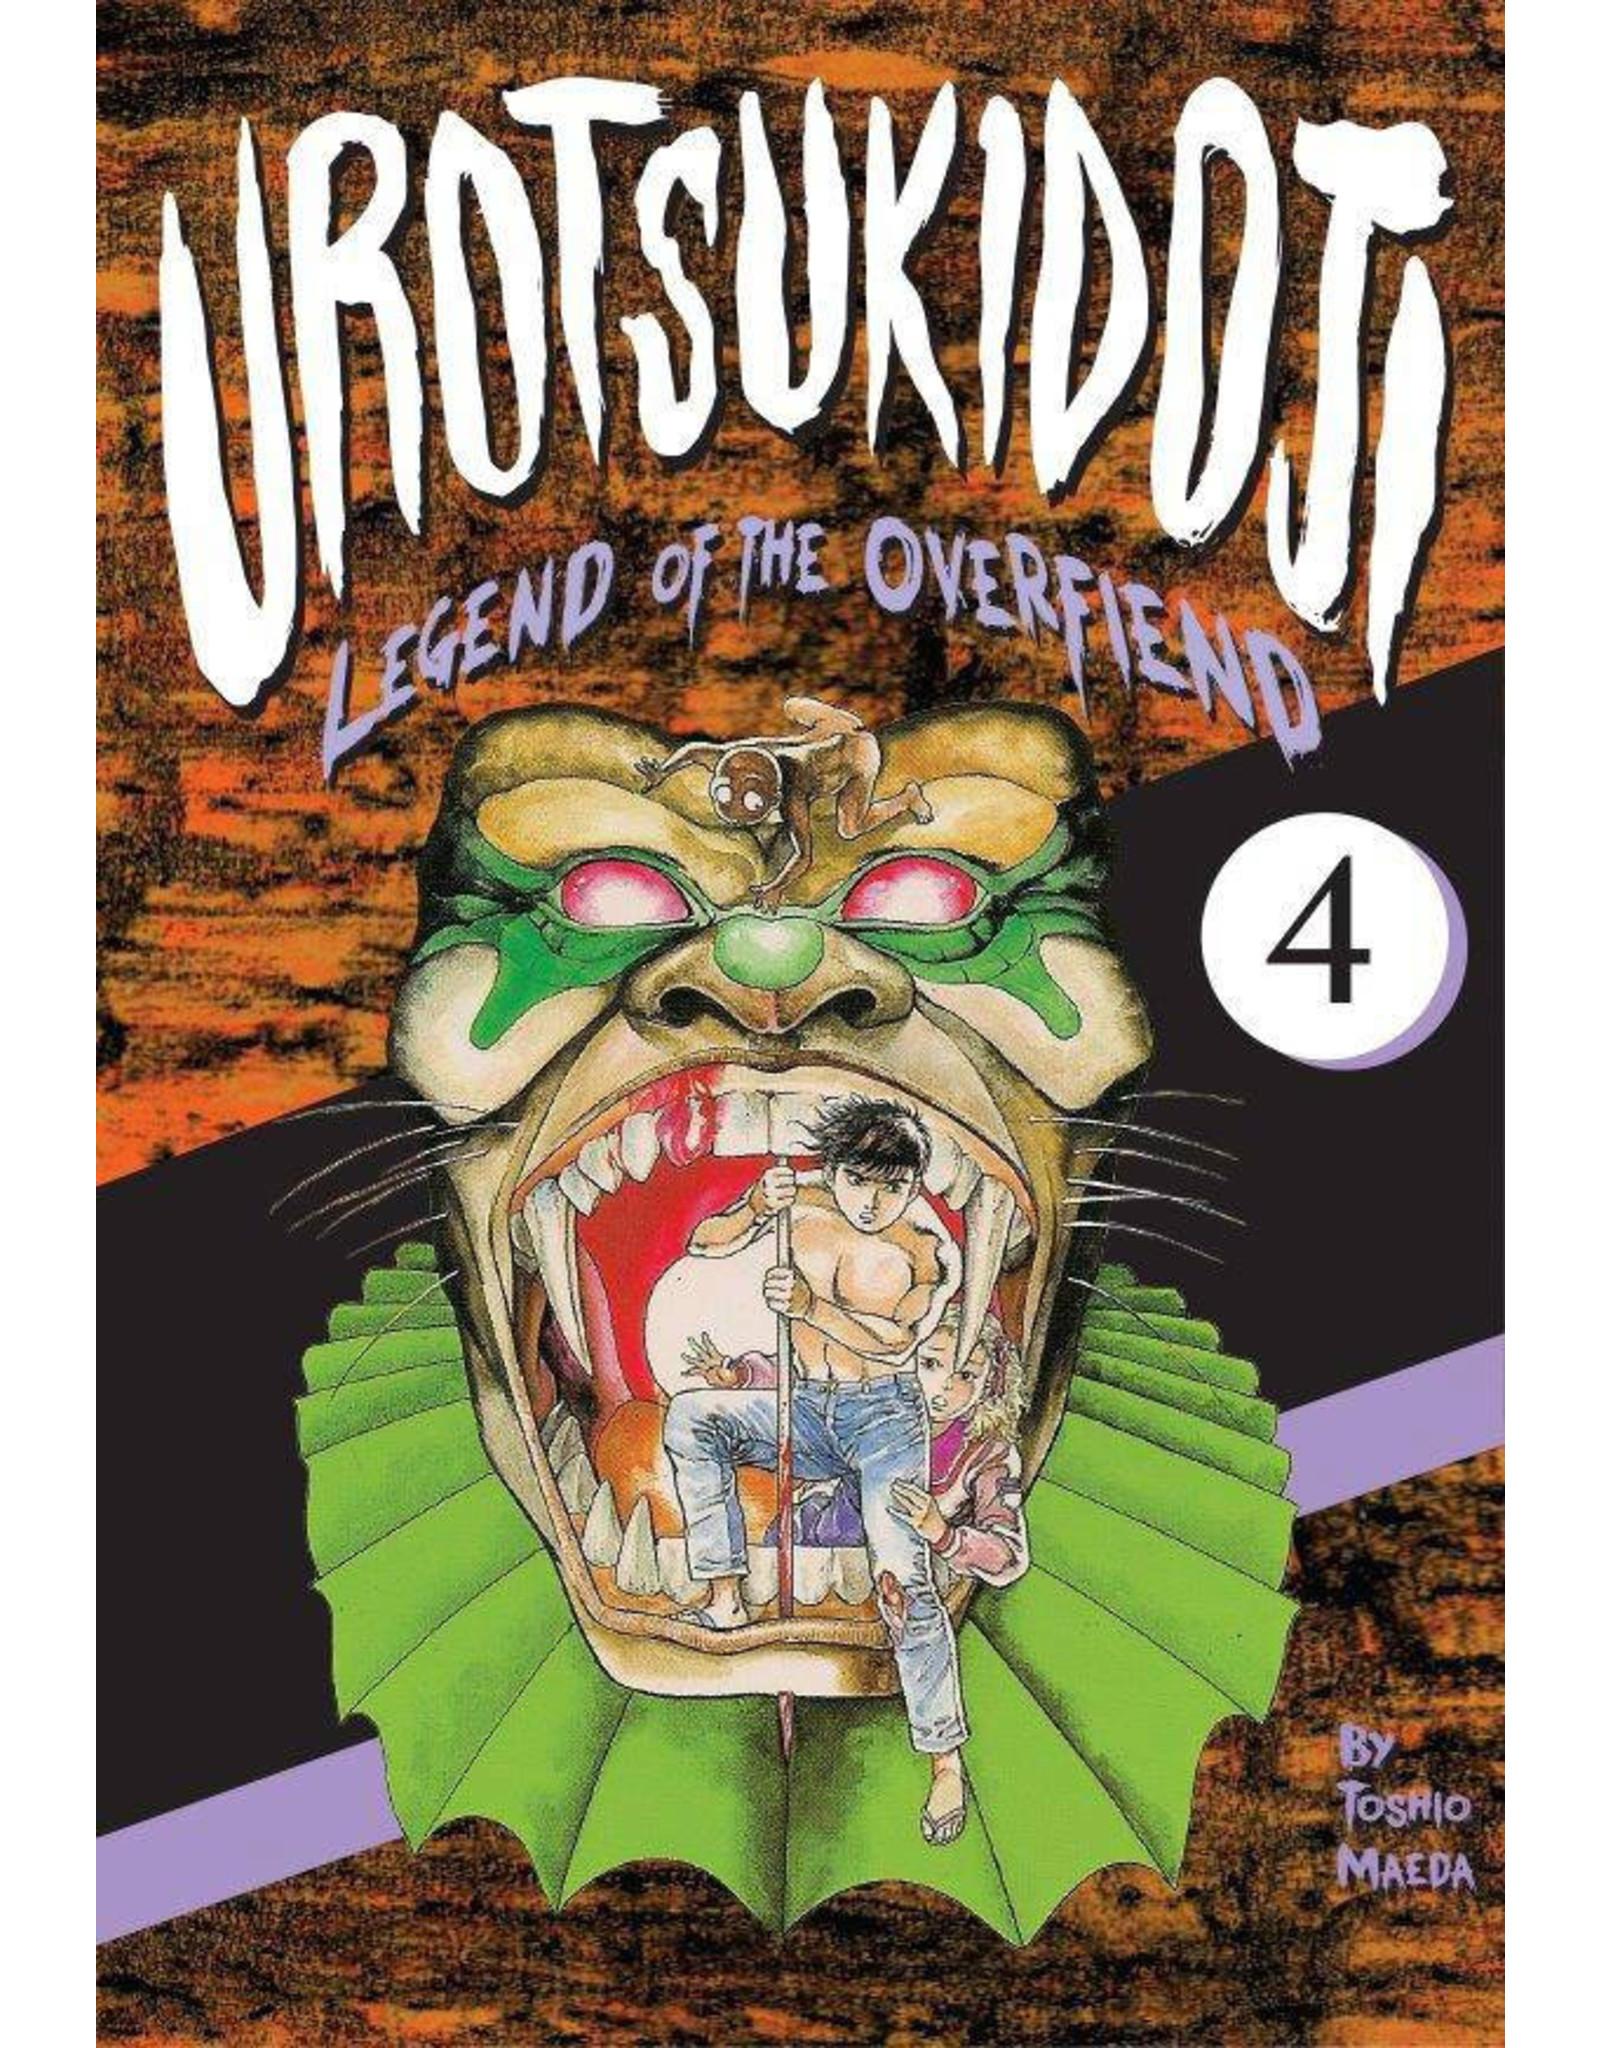 XXX Hentai - Urotsukidoji: Legend of Overfiend 4 (English Version)